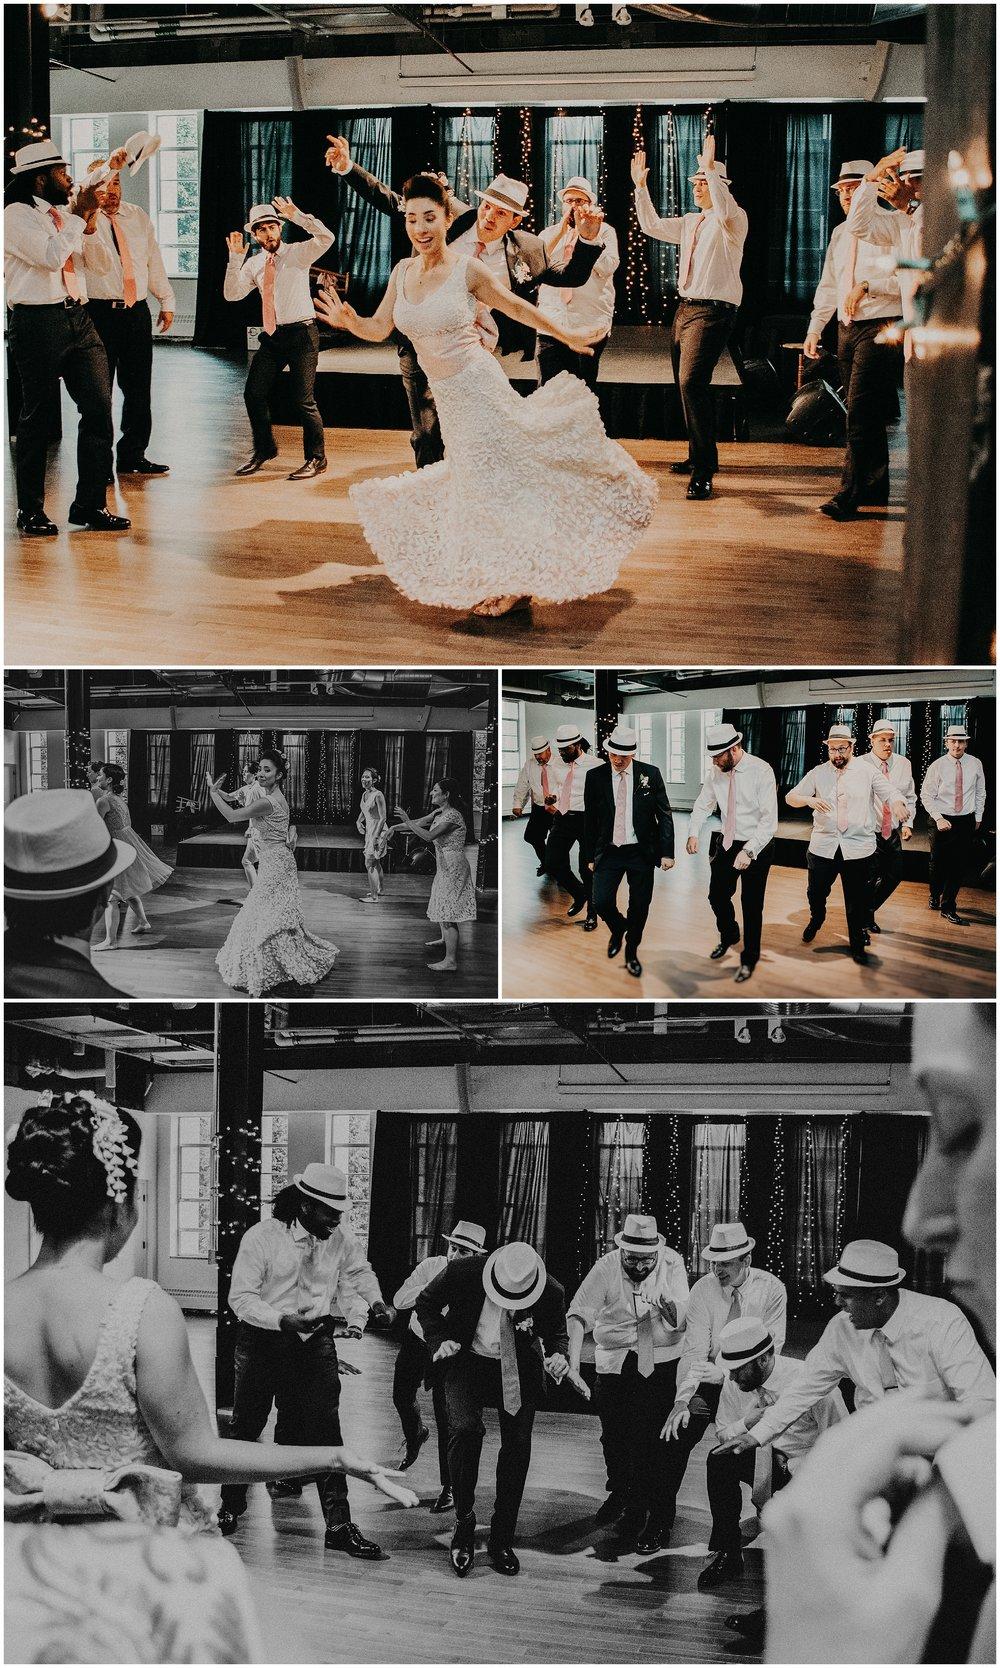 mcnichols_civic_center_colorado_wedding_photographer16